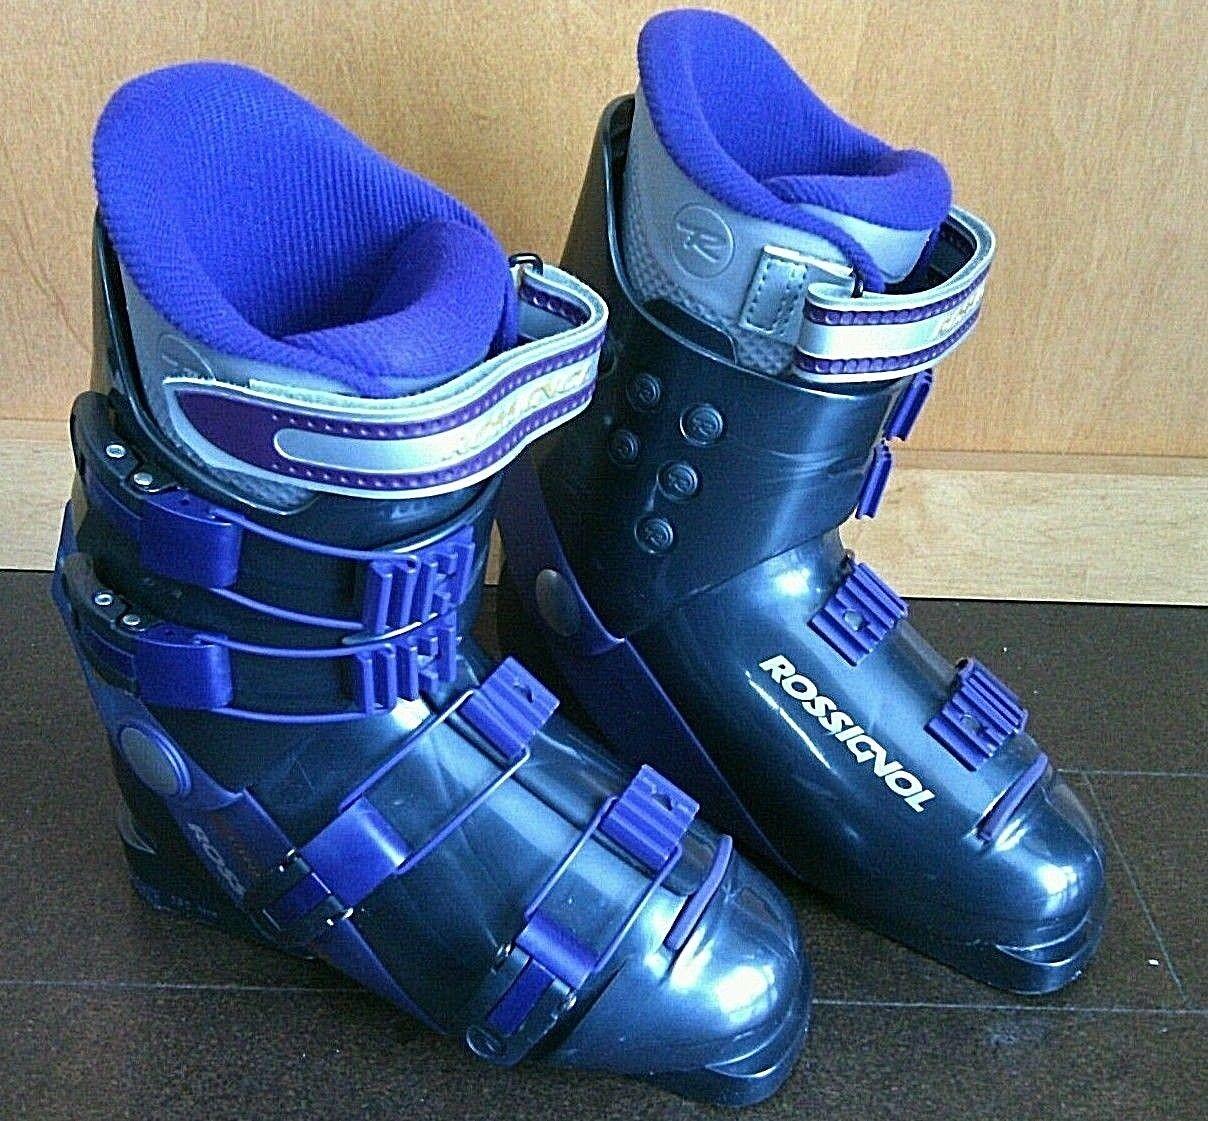 Winter Sports Ski Boots Rossignol  R725 Mondo 24.5 Women's Size 7 BSL 282 mm Fit  on sale 70% off